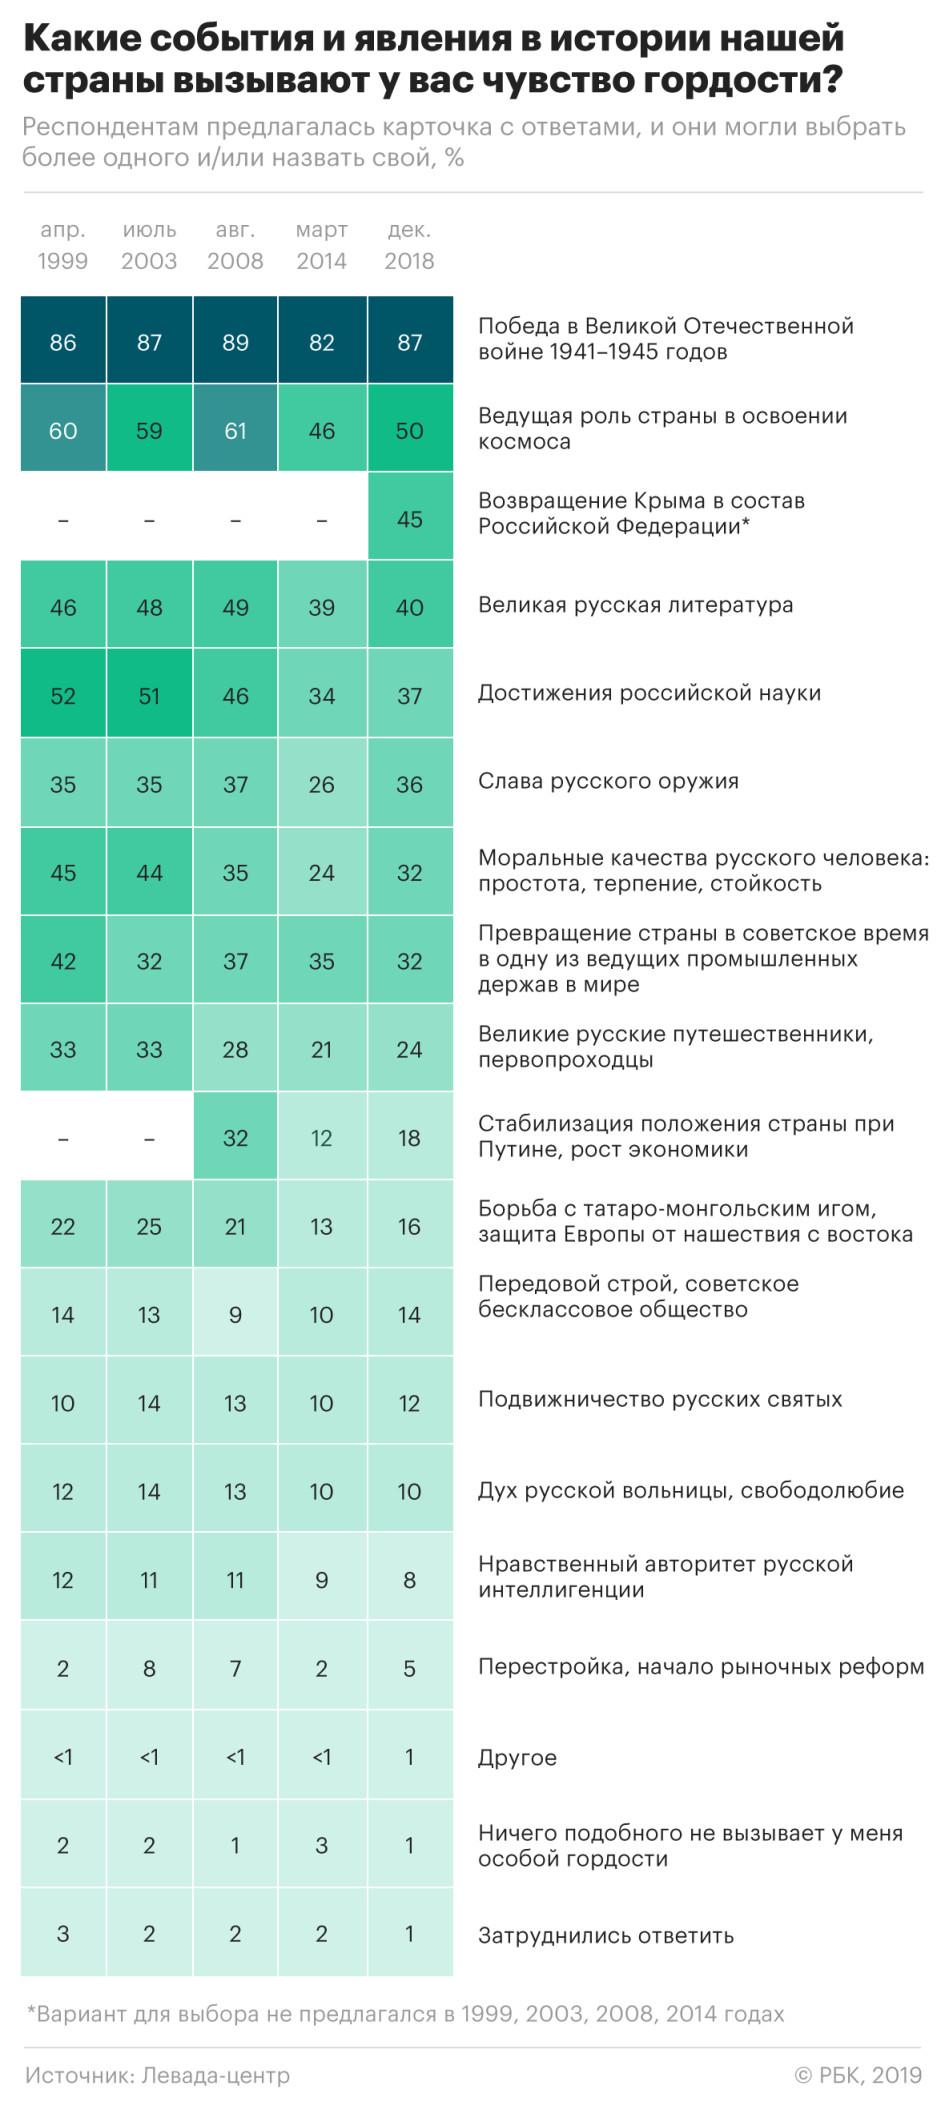 https://s0.rbk.ru/v6_top_pics/resized/945xH/media/img/7/23/755475672342237.jpeg